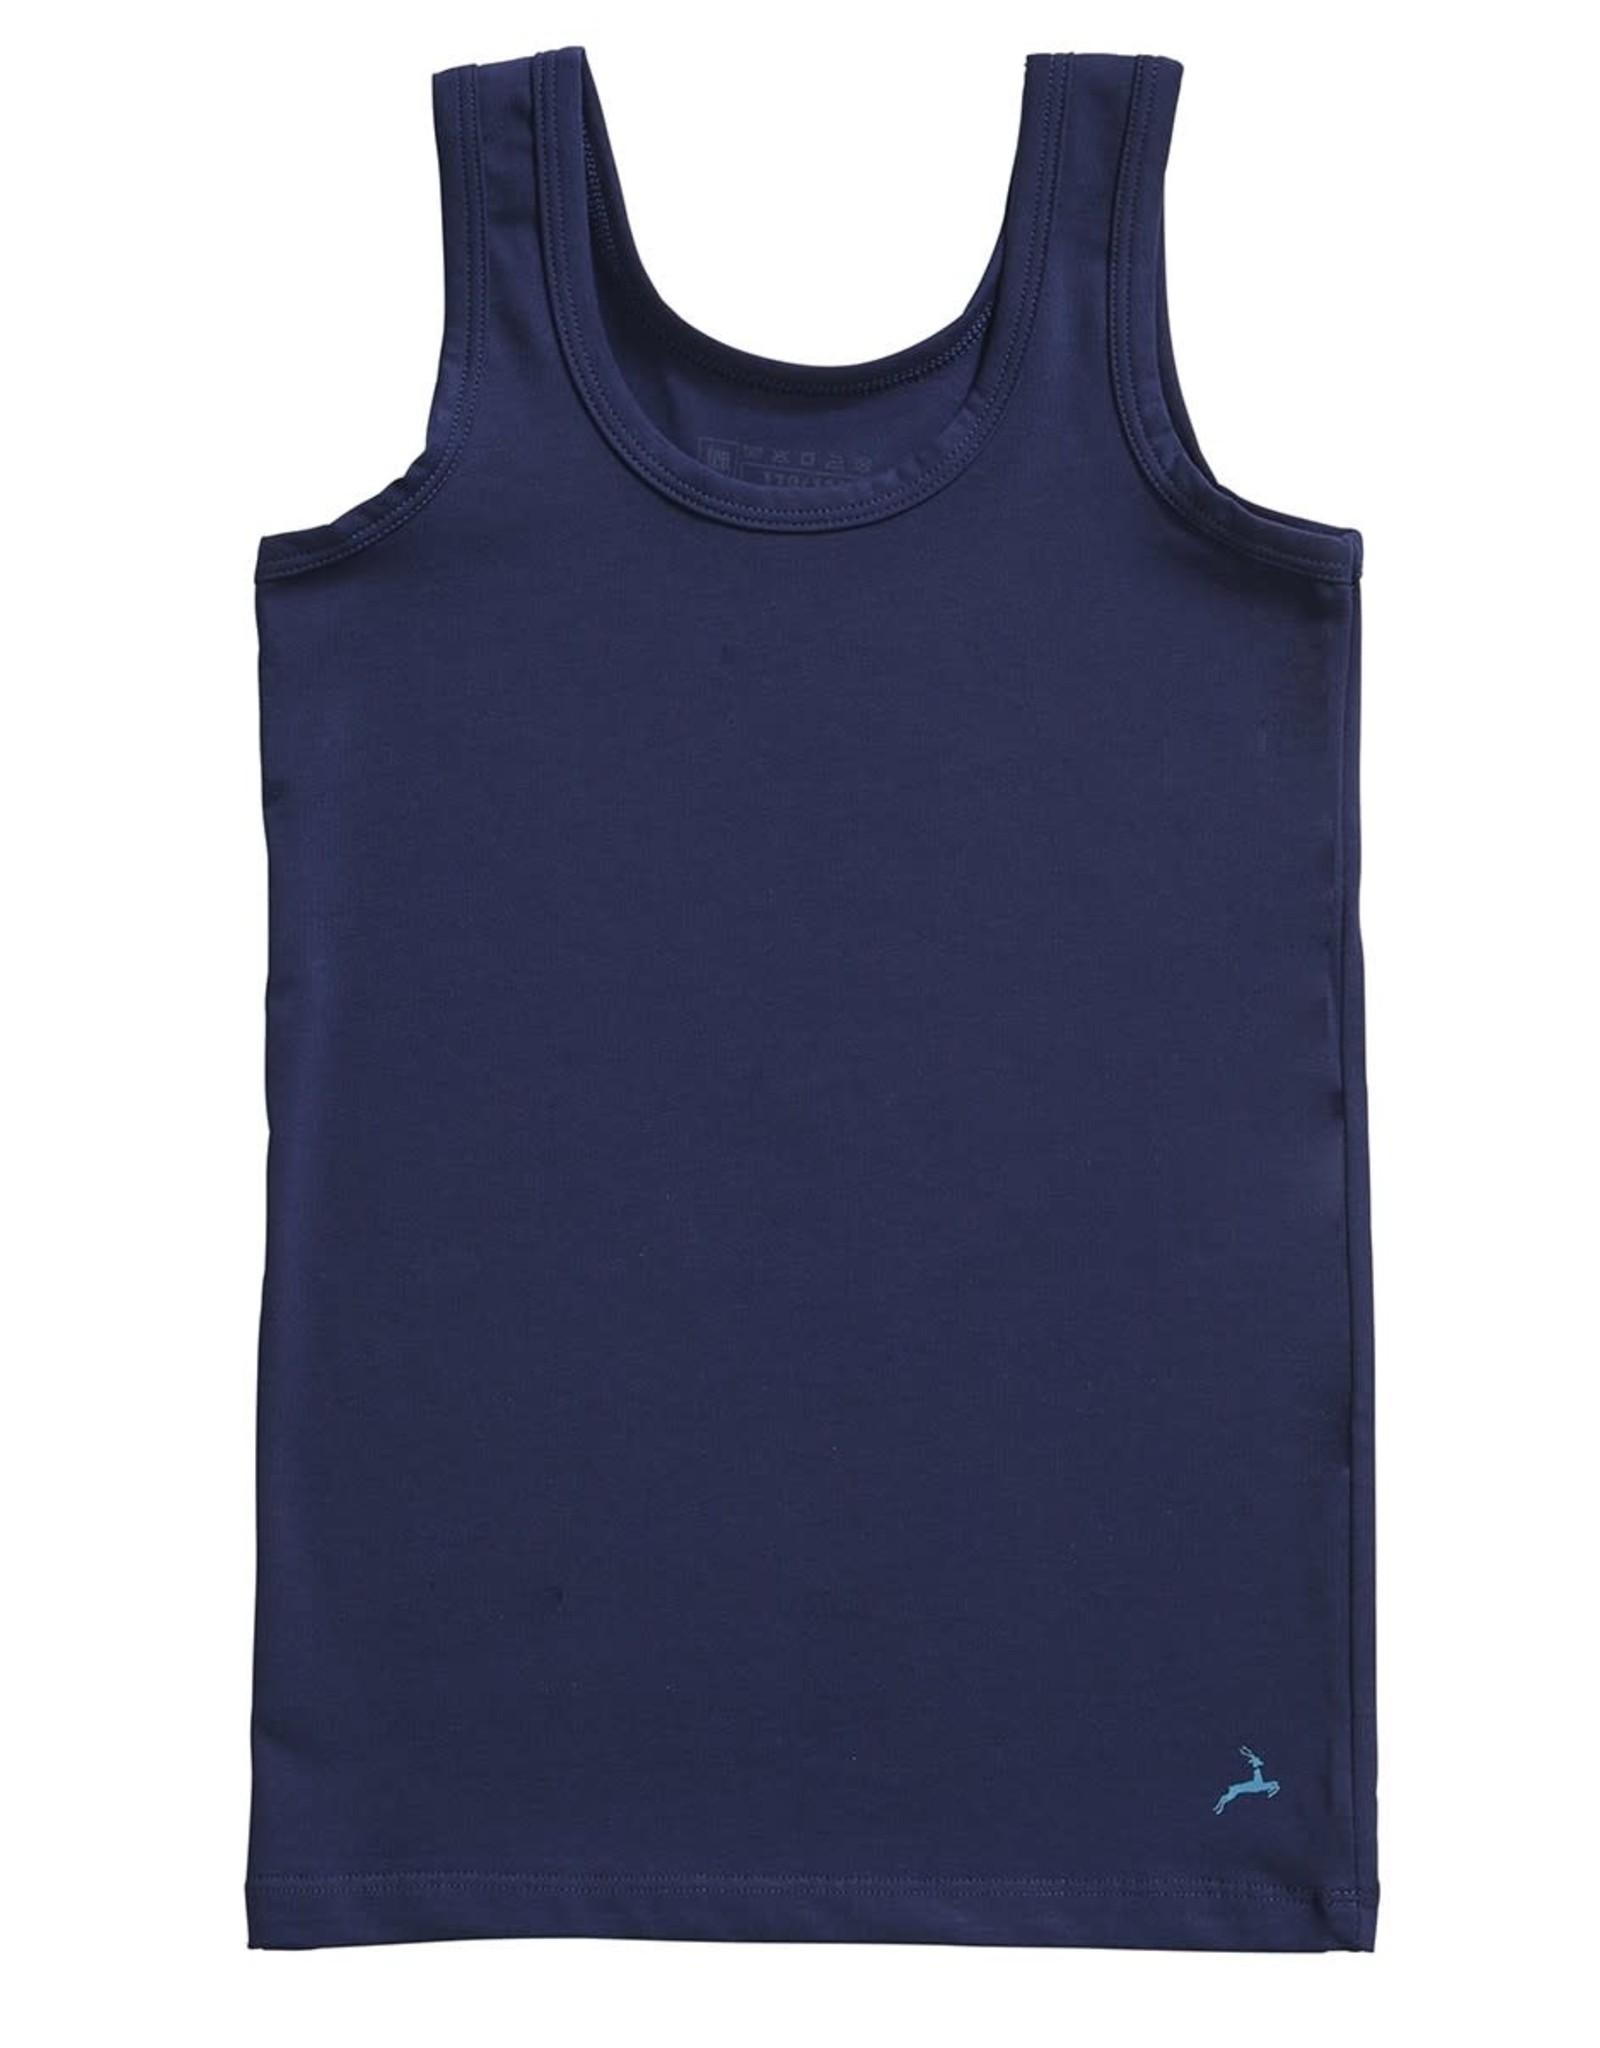 Ten Cate Basic boys shirt medieval blue